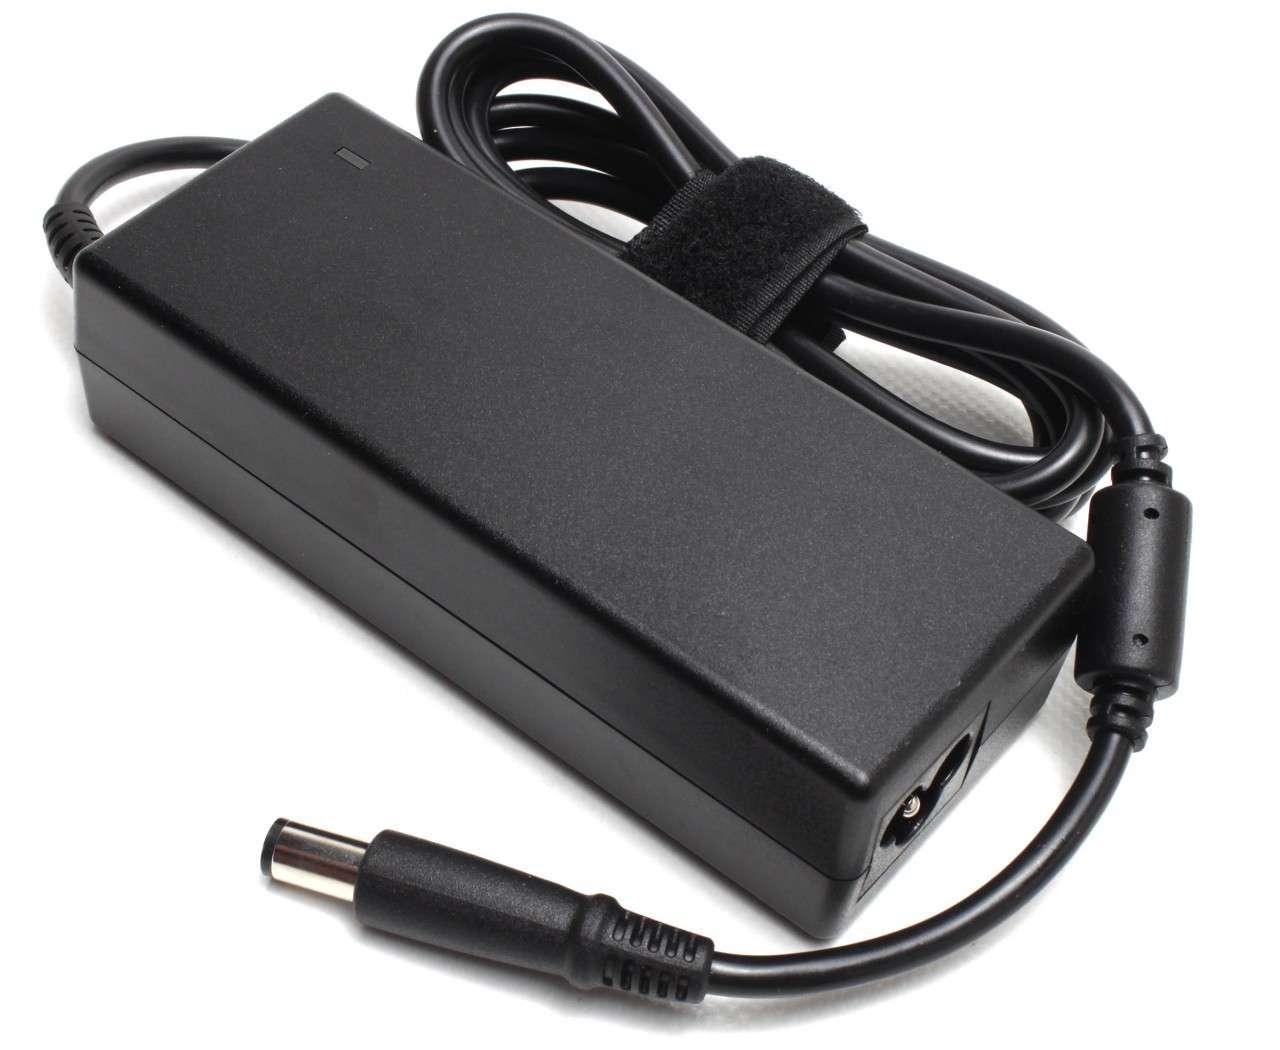 Incarcator Dell Studio 1536 VARIANTA 3 imagine powerlaptop.ro 2021